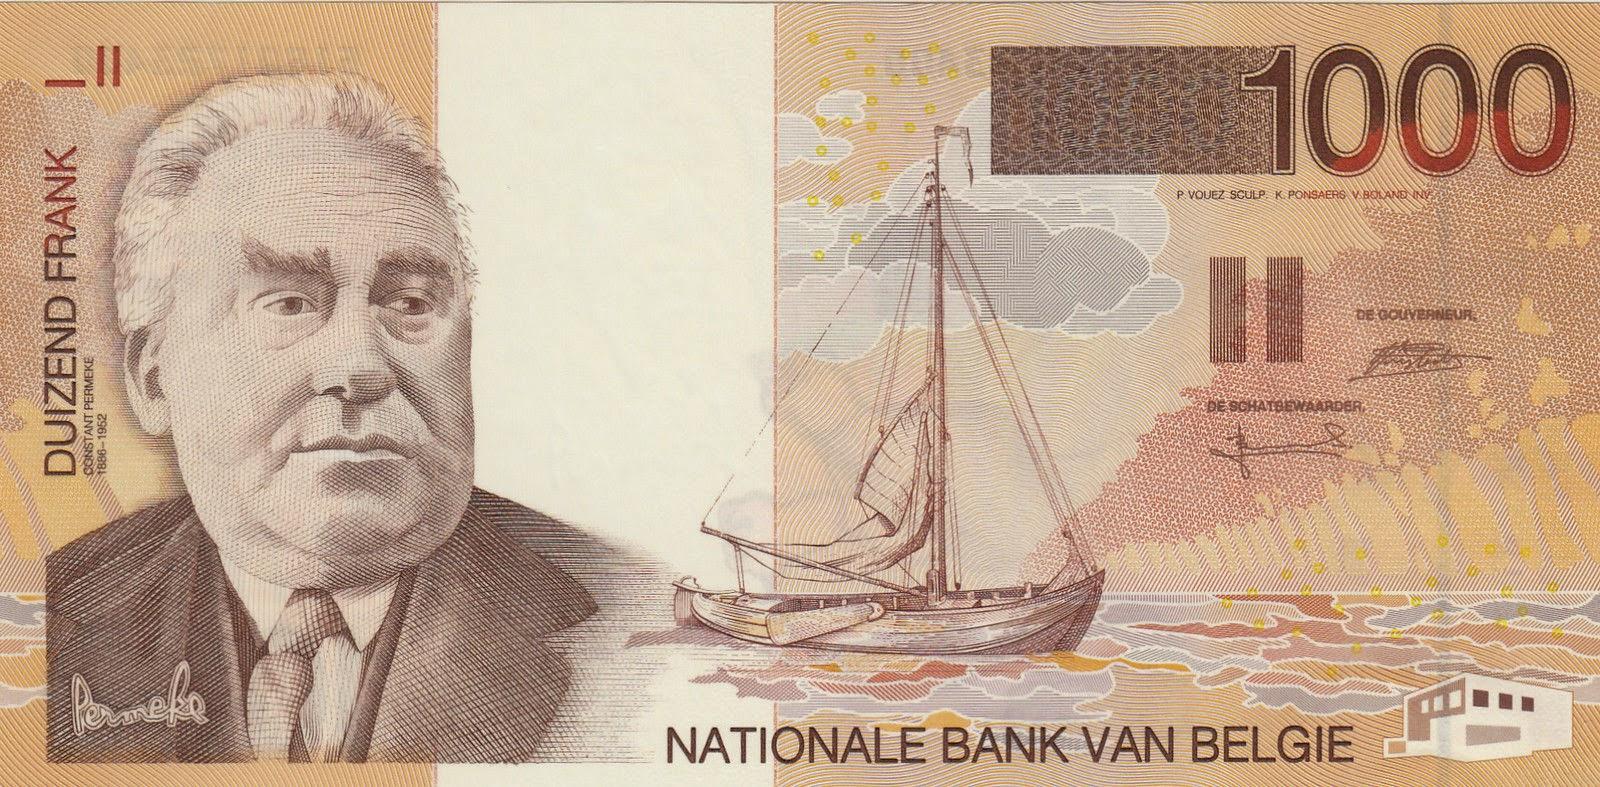 Belgium Banknotes 1000 Belgian Francs banknote 1998 painter and sculptor Constant Permeke